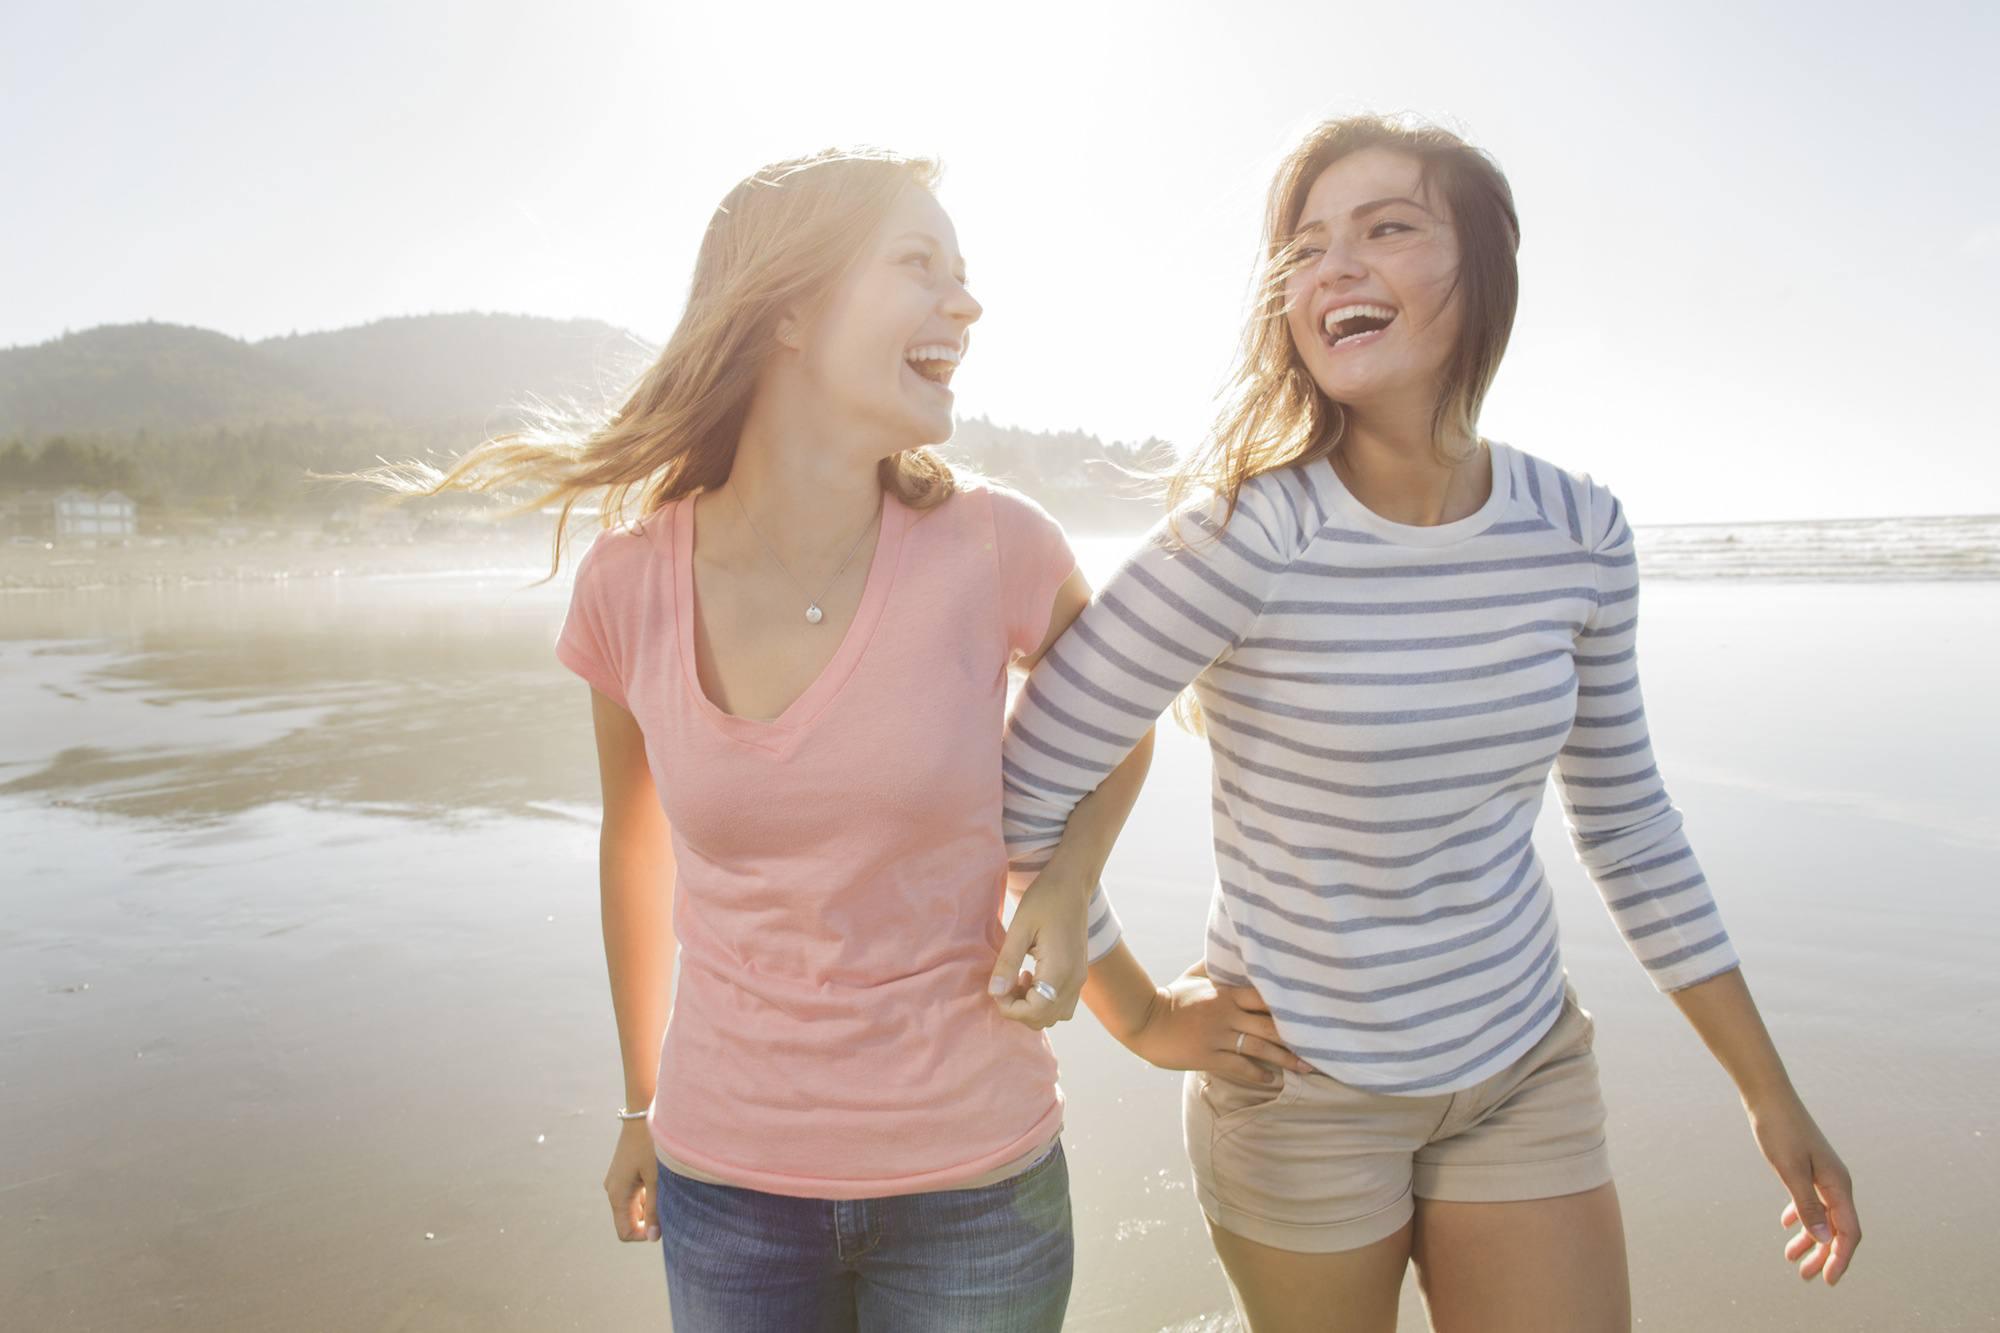 Young Woman Having Fun Walking on the beach